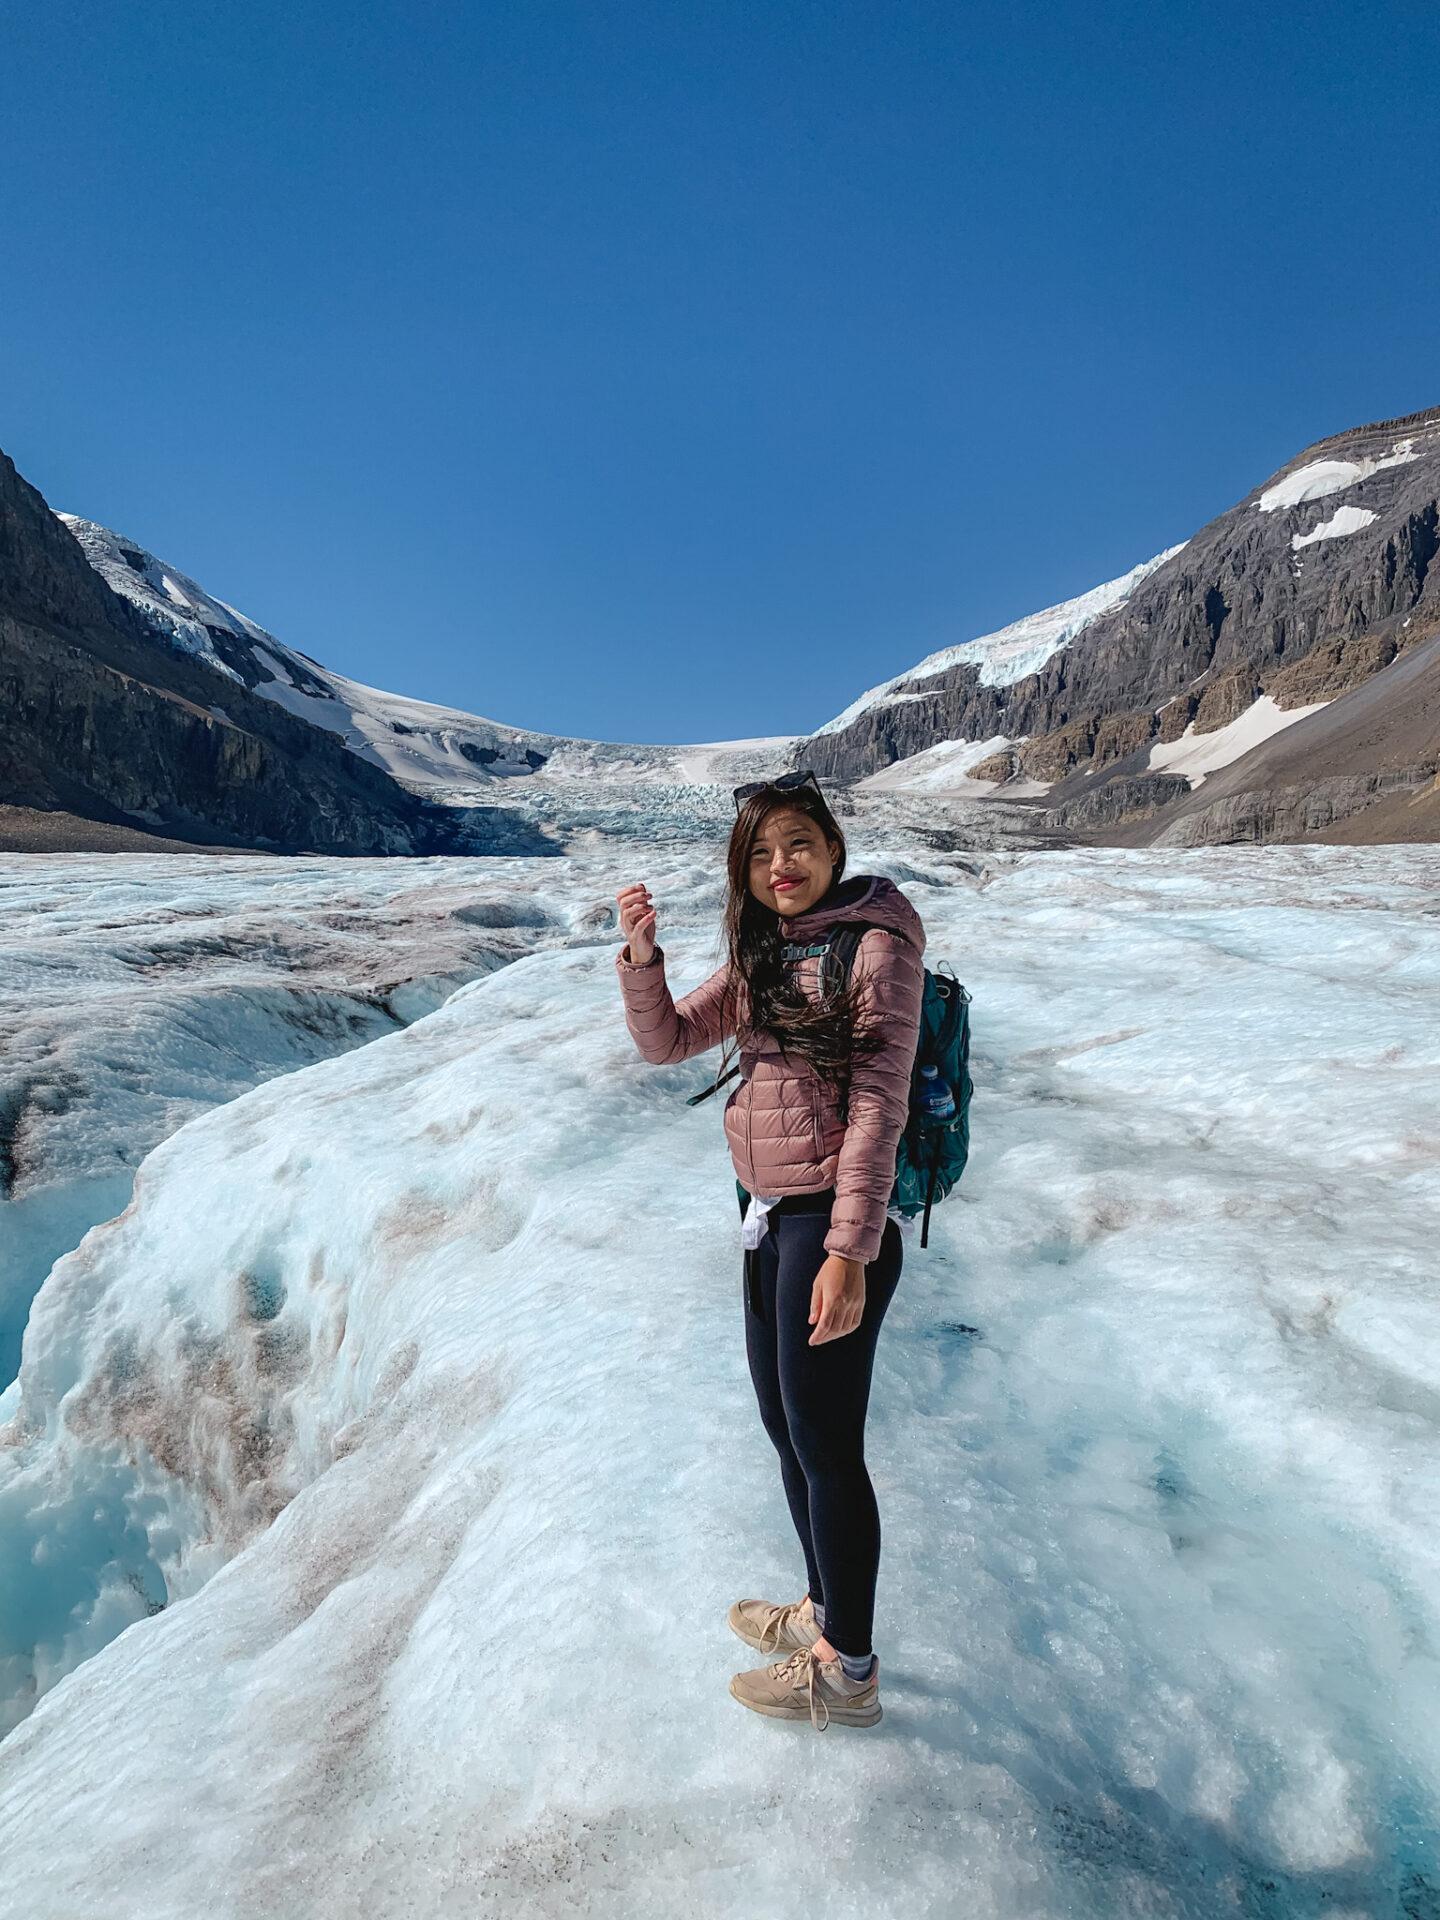 Athabasca Glacier at Columbia Icefield Glacier Adventure in Jasper National Park, Alberta